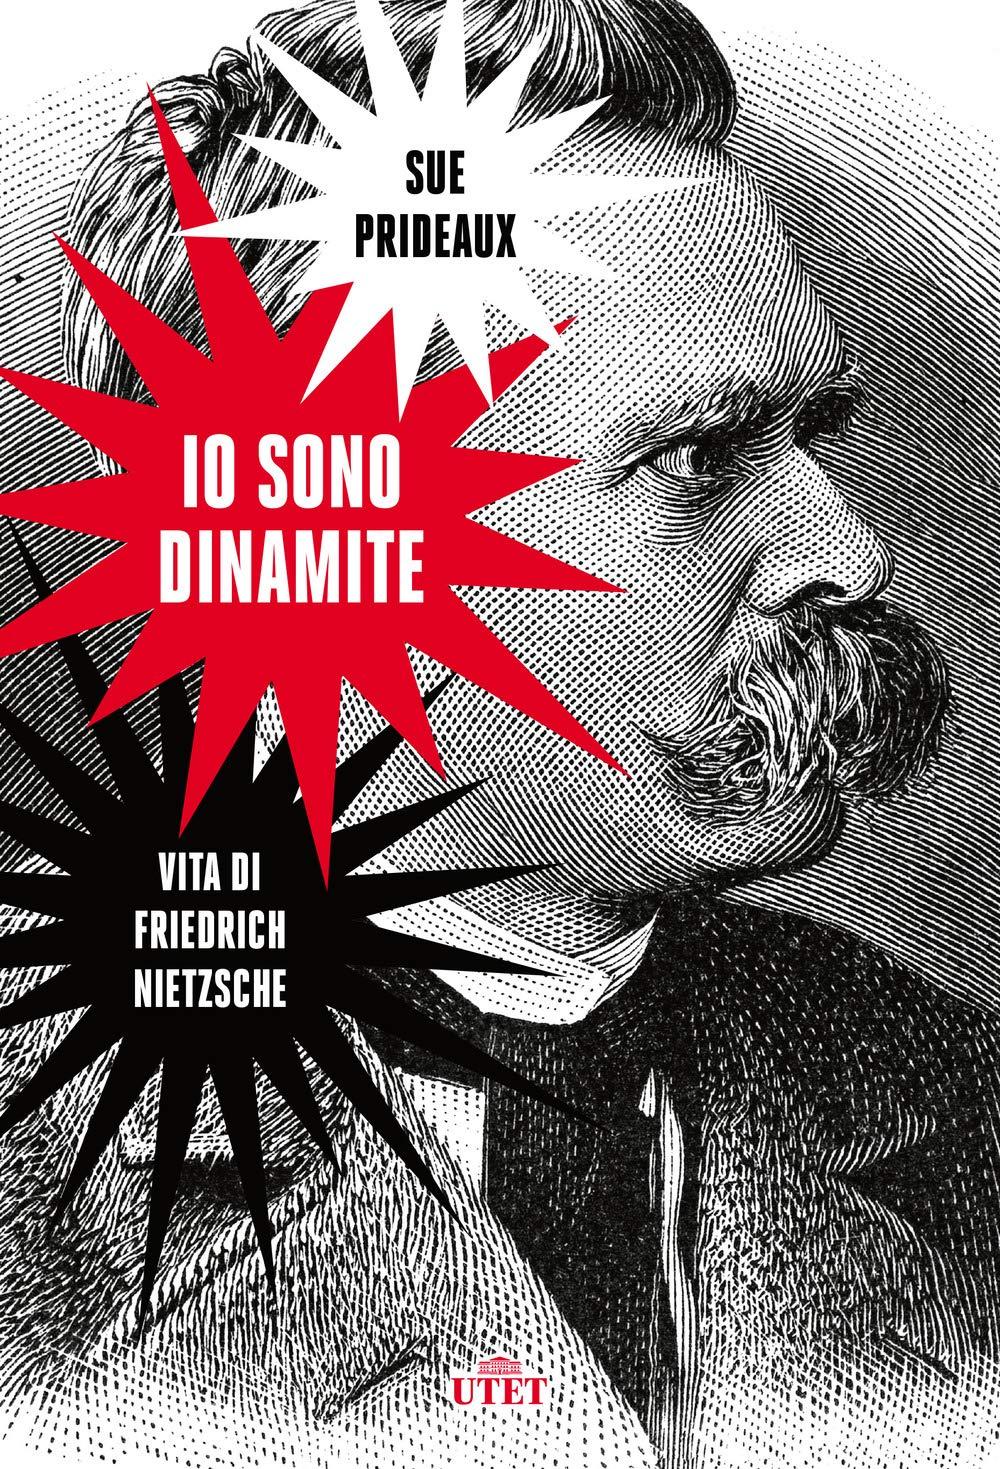 Io sono dinamite. Vita di Friedrich Nietzsche: Amazon.es: Prideaux, Sue, Dalla Fontana, L. A.: Libros en idiomas extranjeros